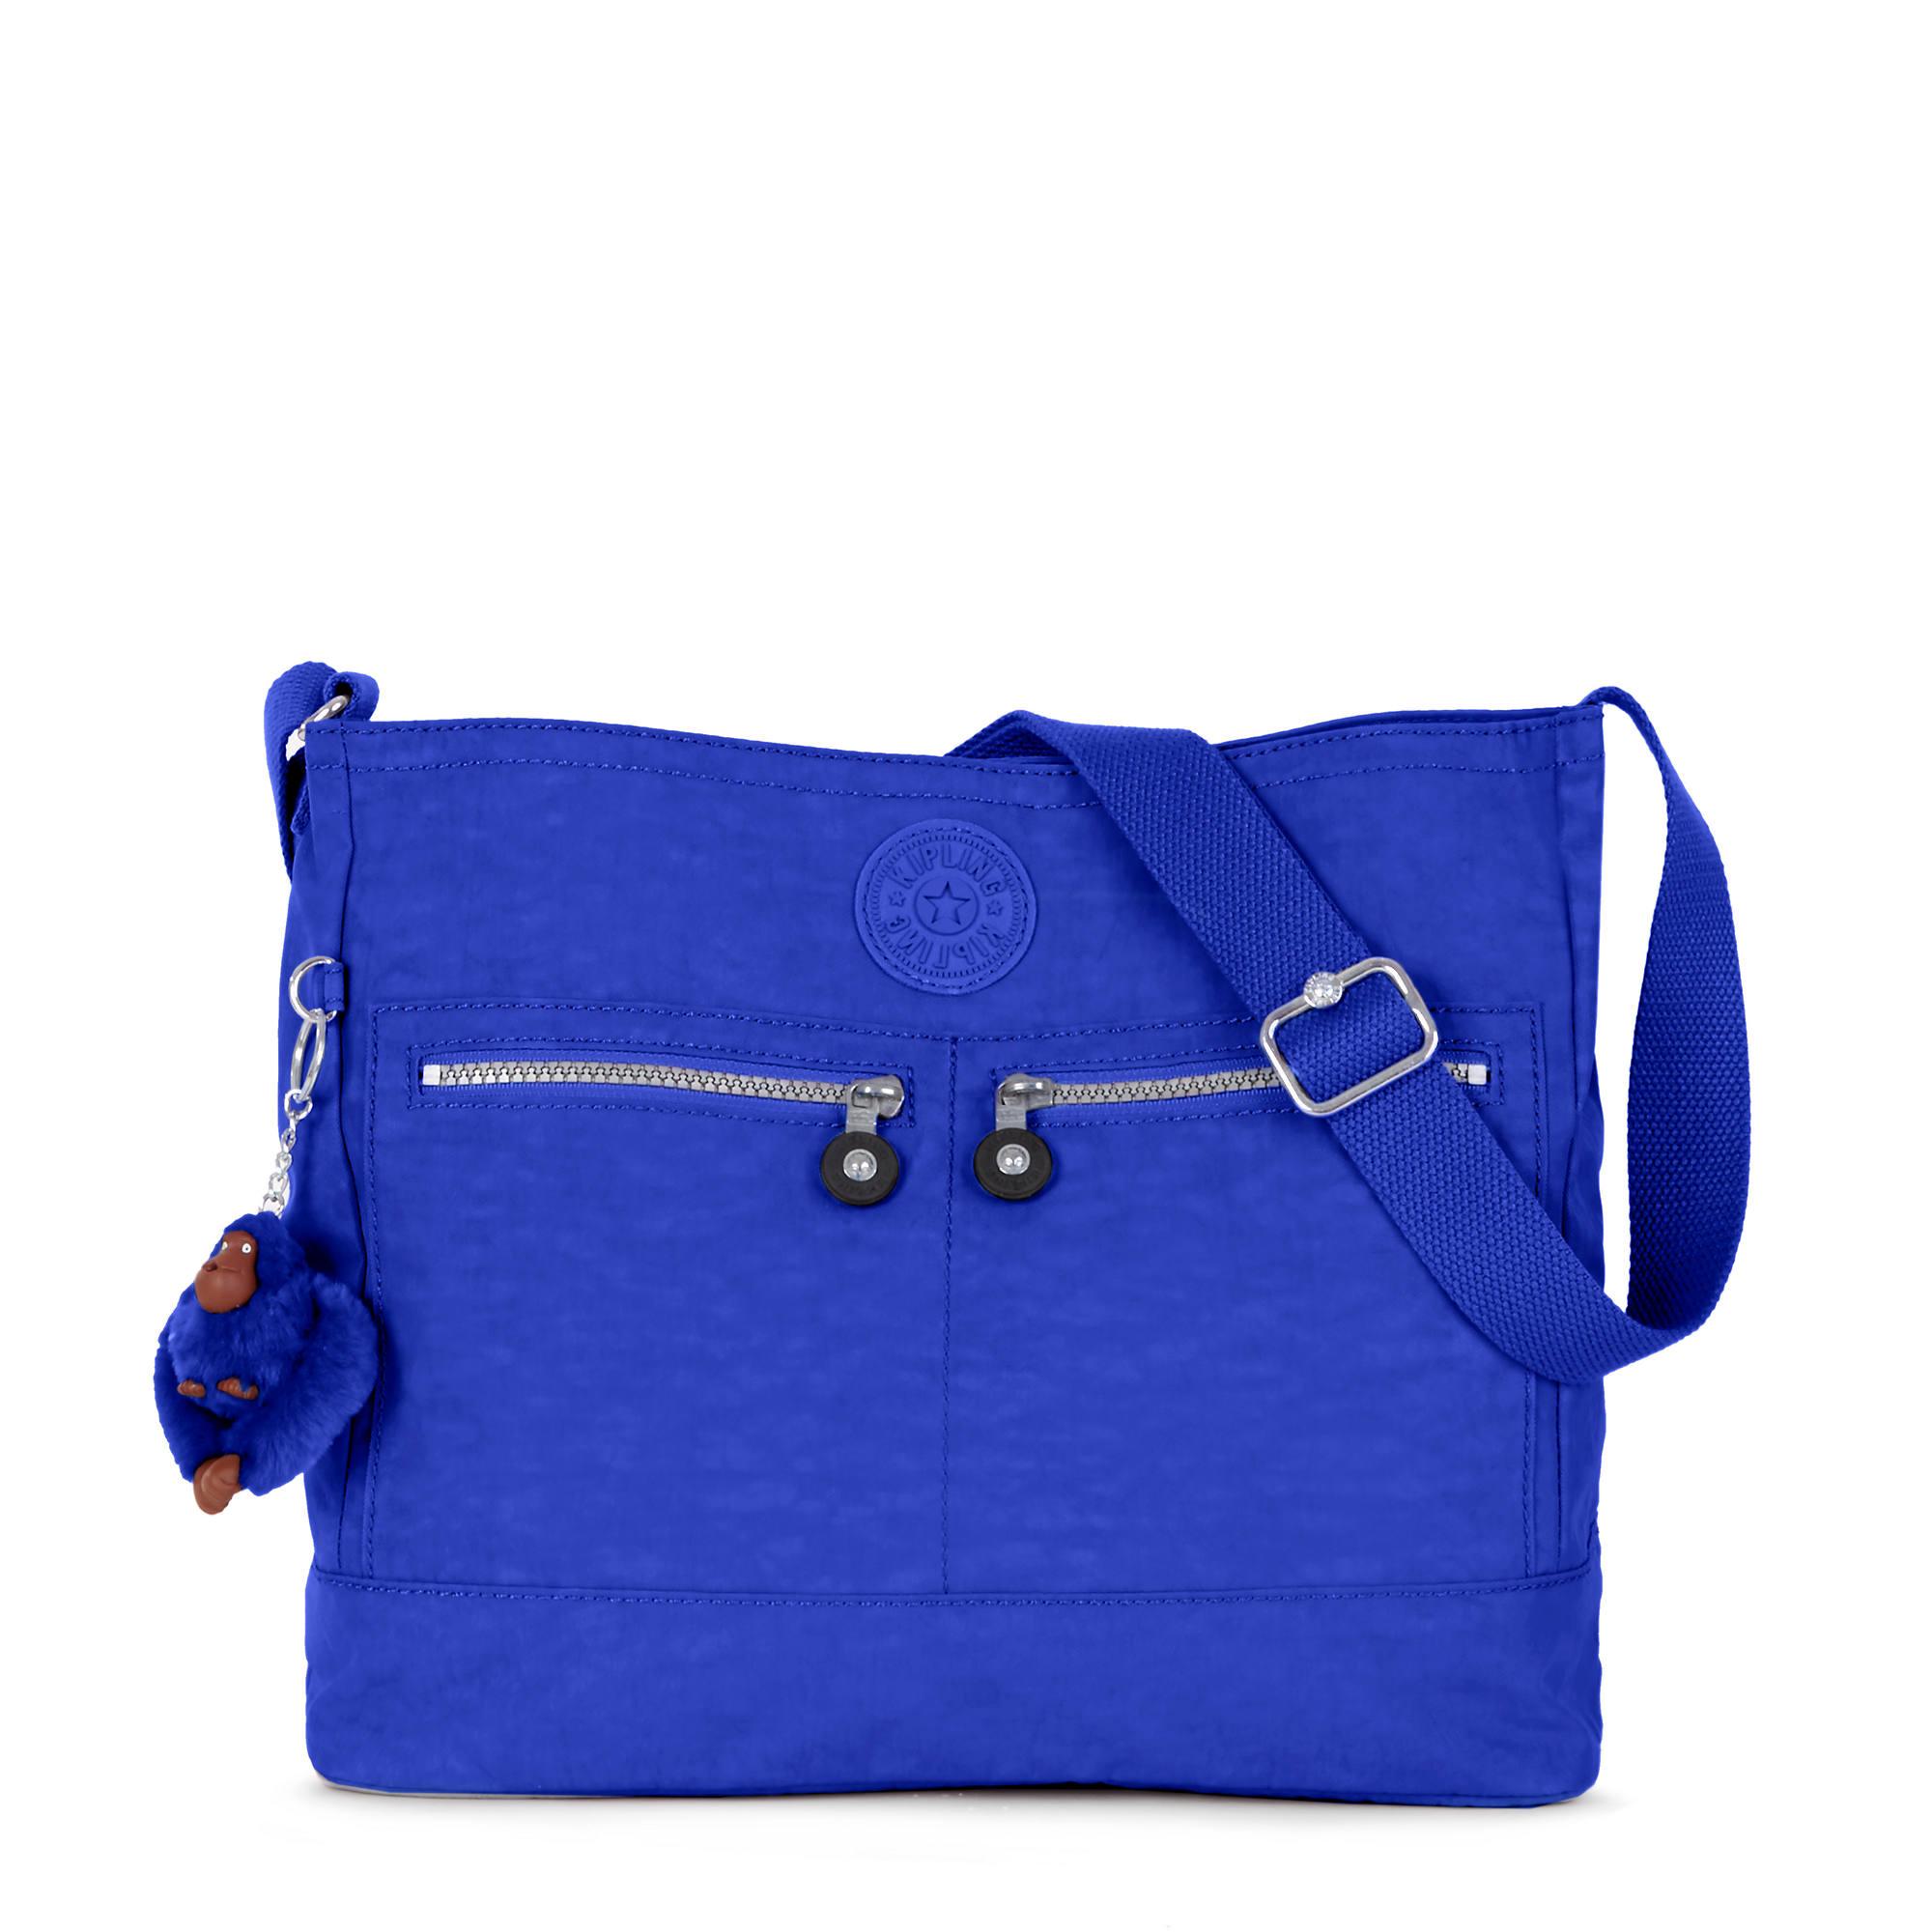 Michelle Handbag Glass Bottom Blue Large